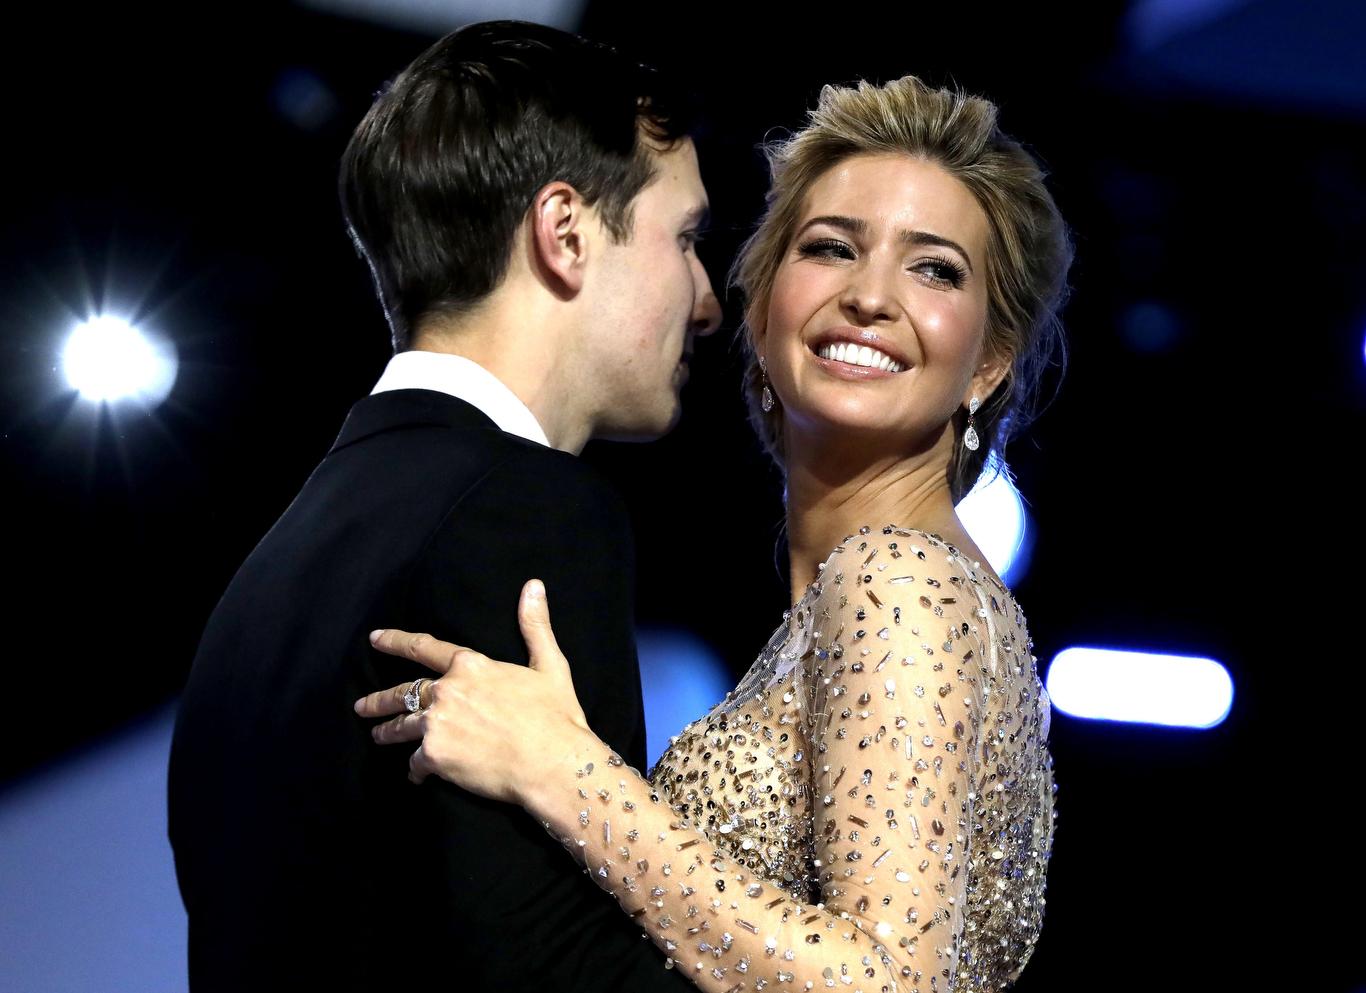 Inaugural Ball Fashion Gallery Ivanka Trump husband Jared Kushner